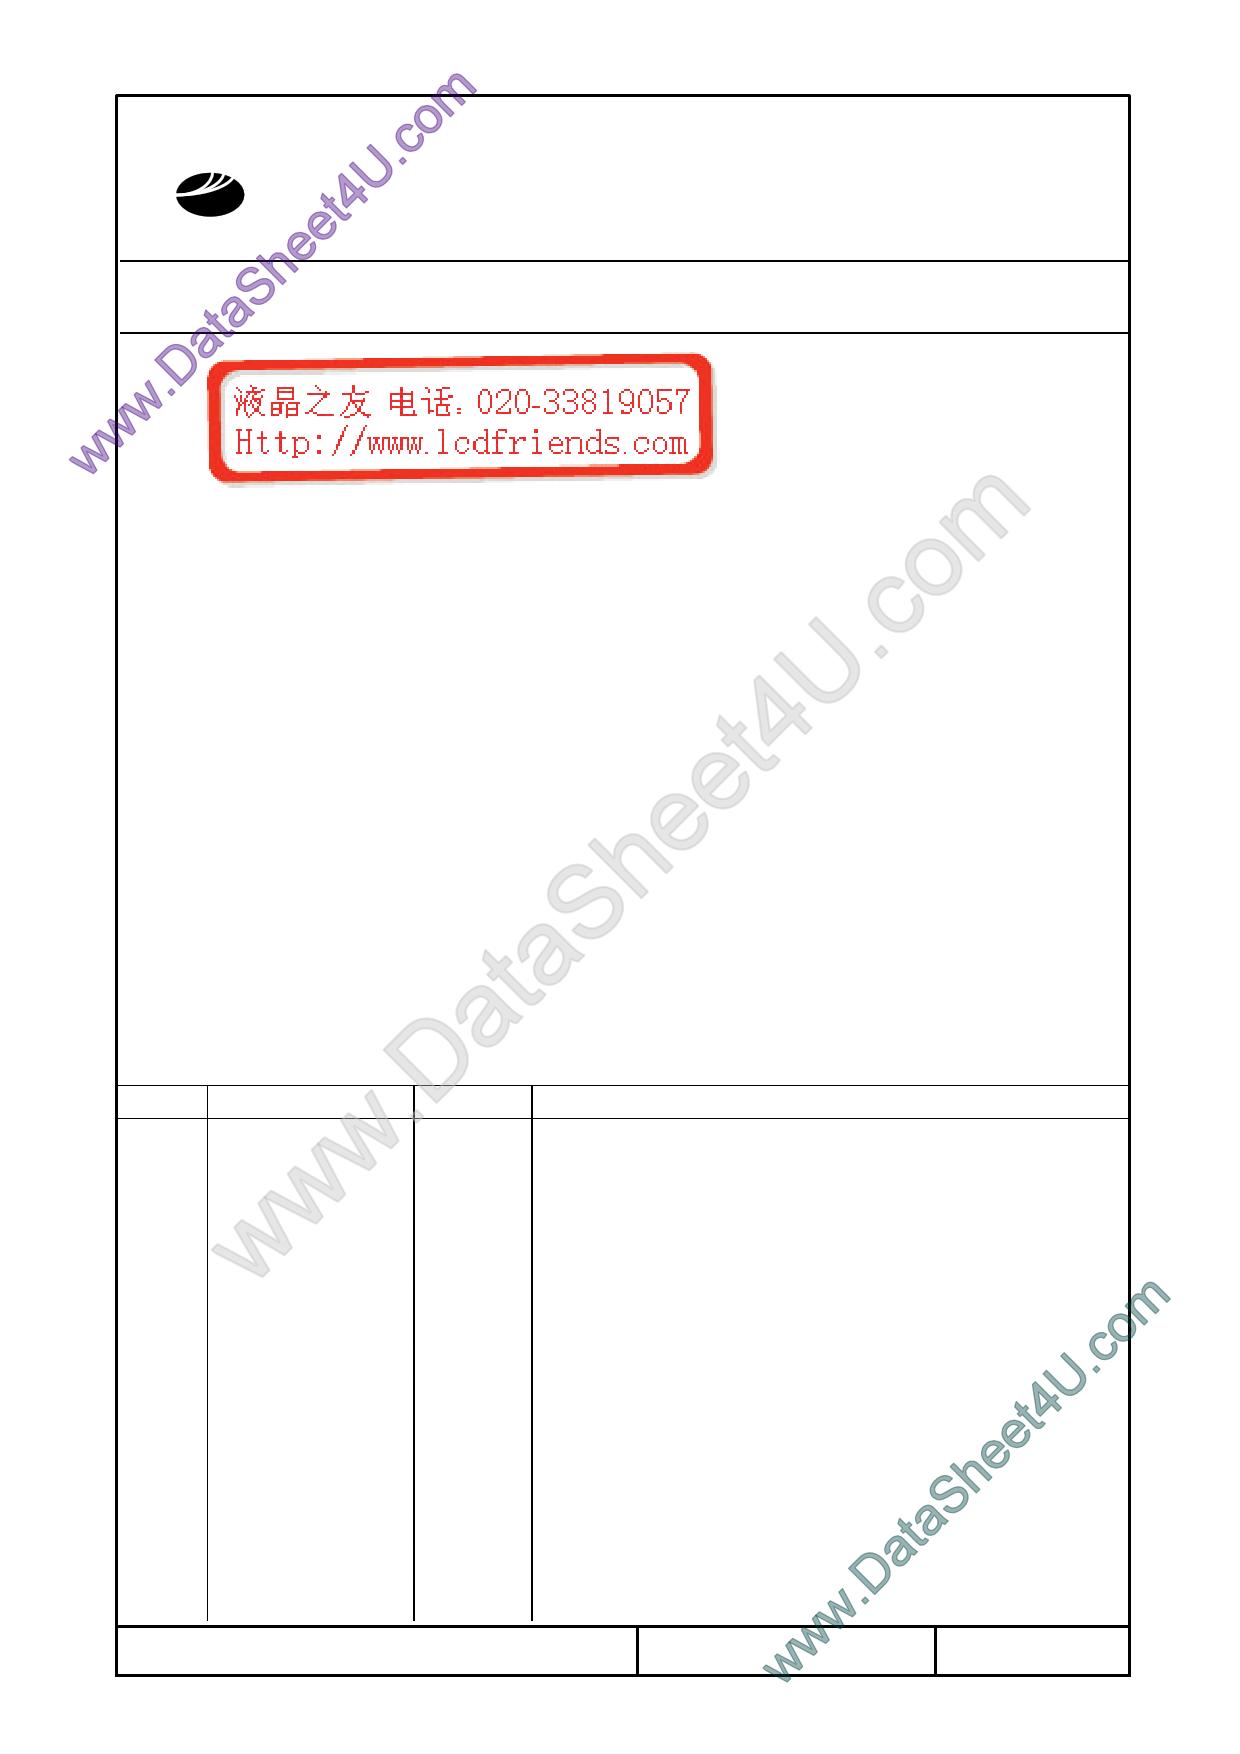 T-51379L035J_FW_P_AA datasheet